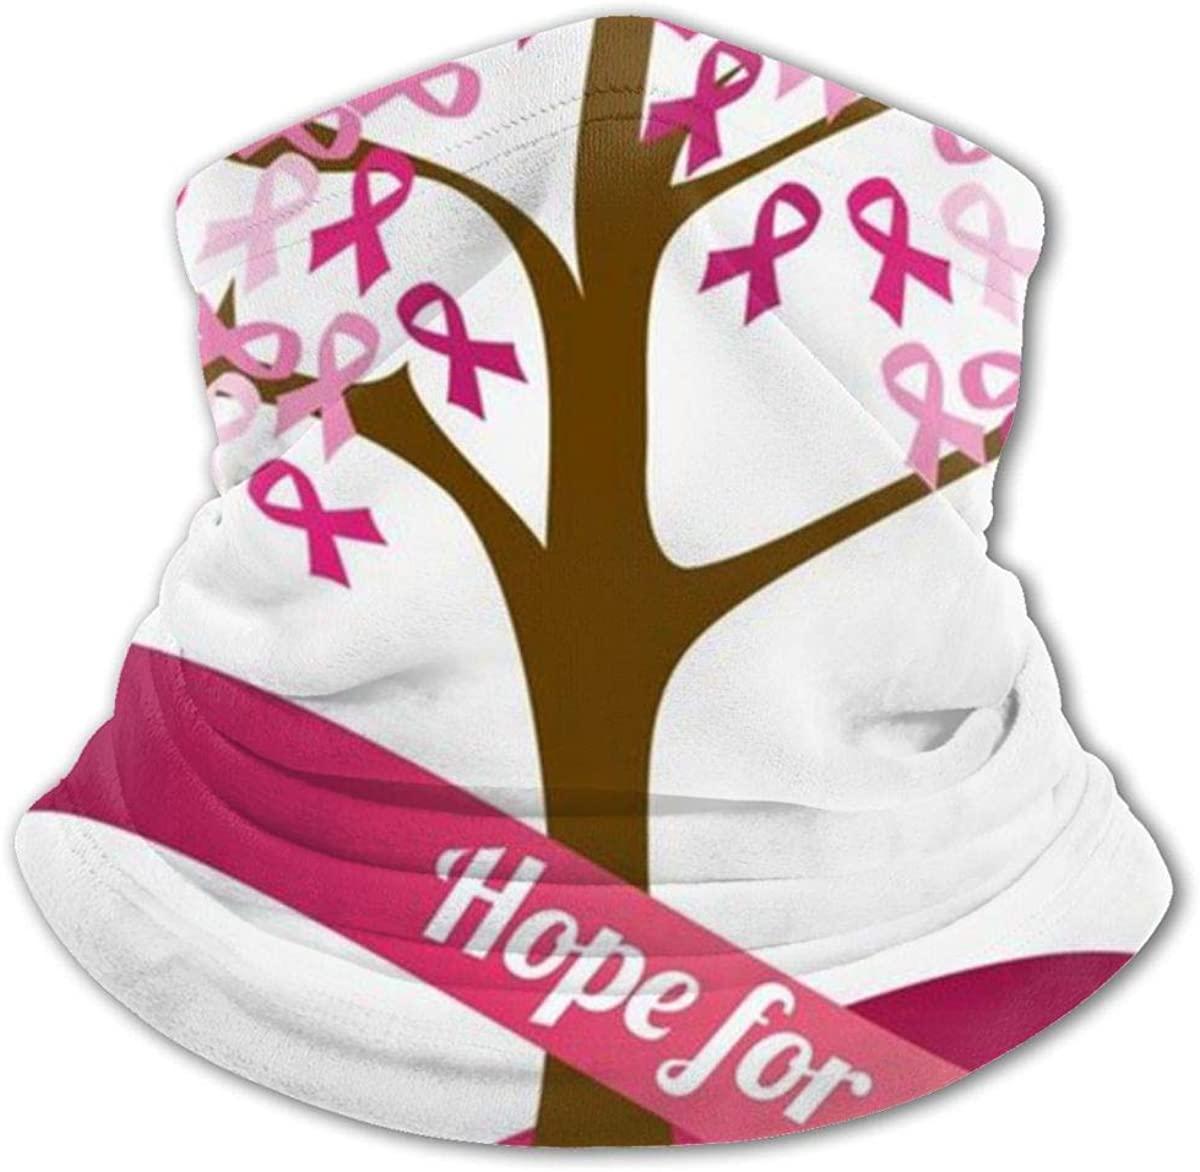 Breast Cancer Red Ribbon Headwear For Girls And Boys, Head Wrap, Neck Gaiter, Headband, Tenn Fishing Mask, Magic Scarf, Tube Mask, Face Bandana Mask For Camping Running Cycling